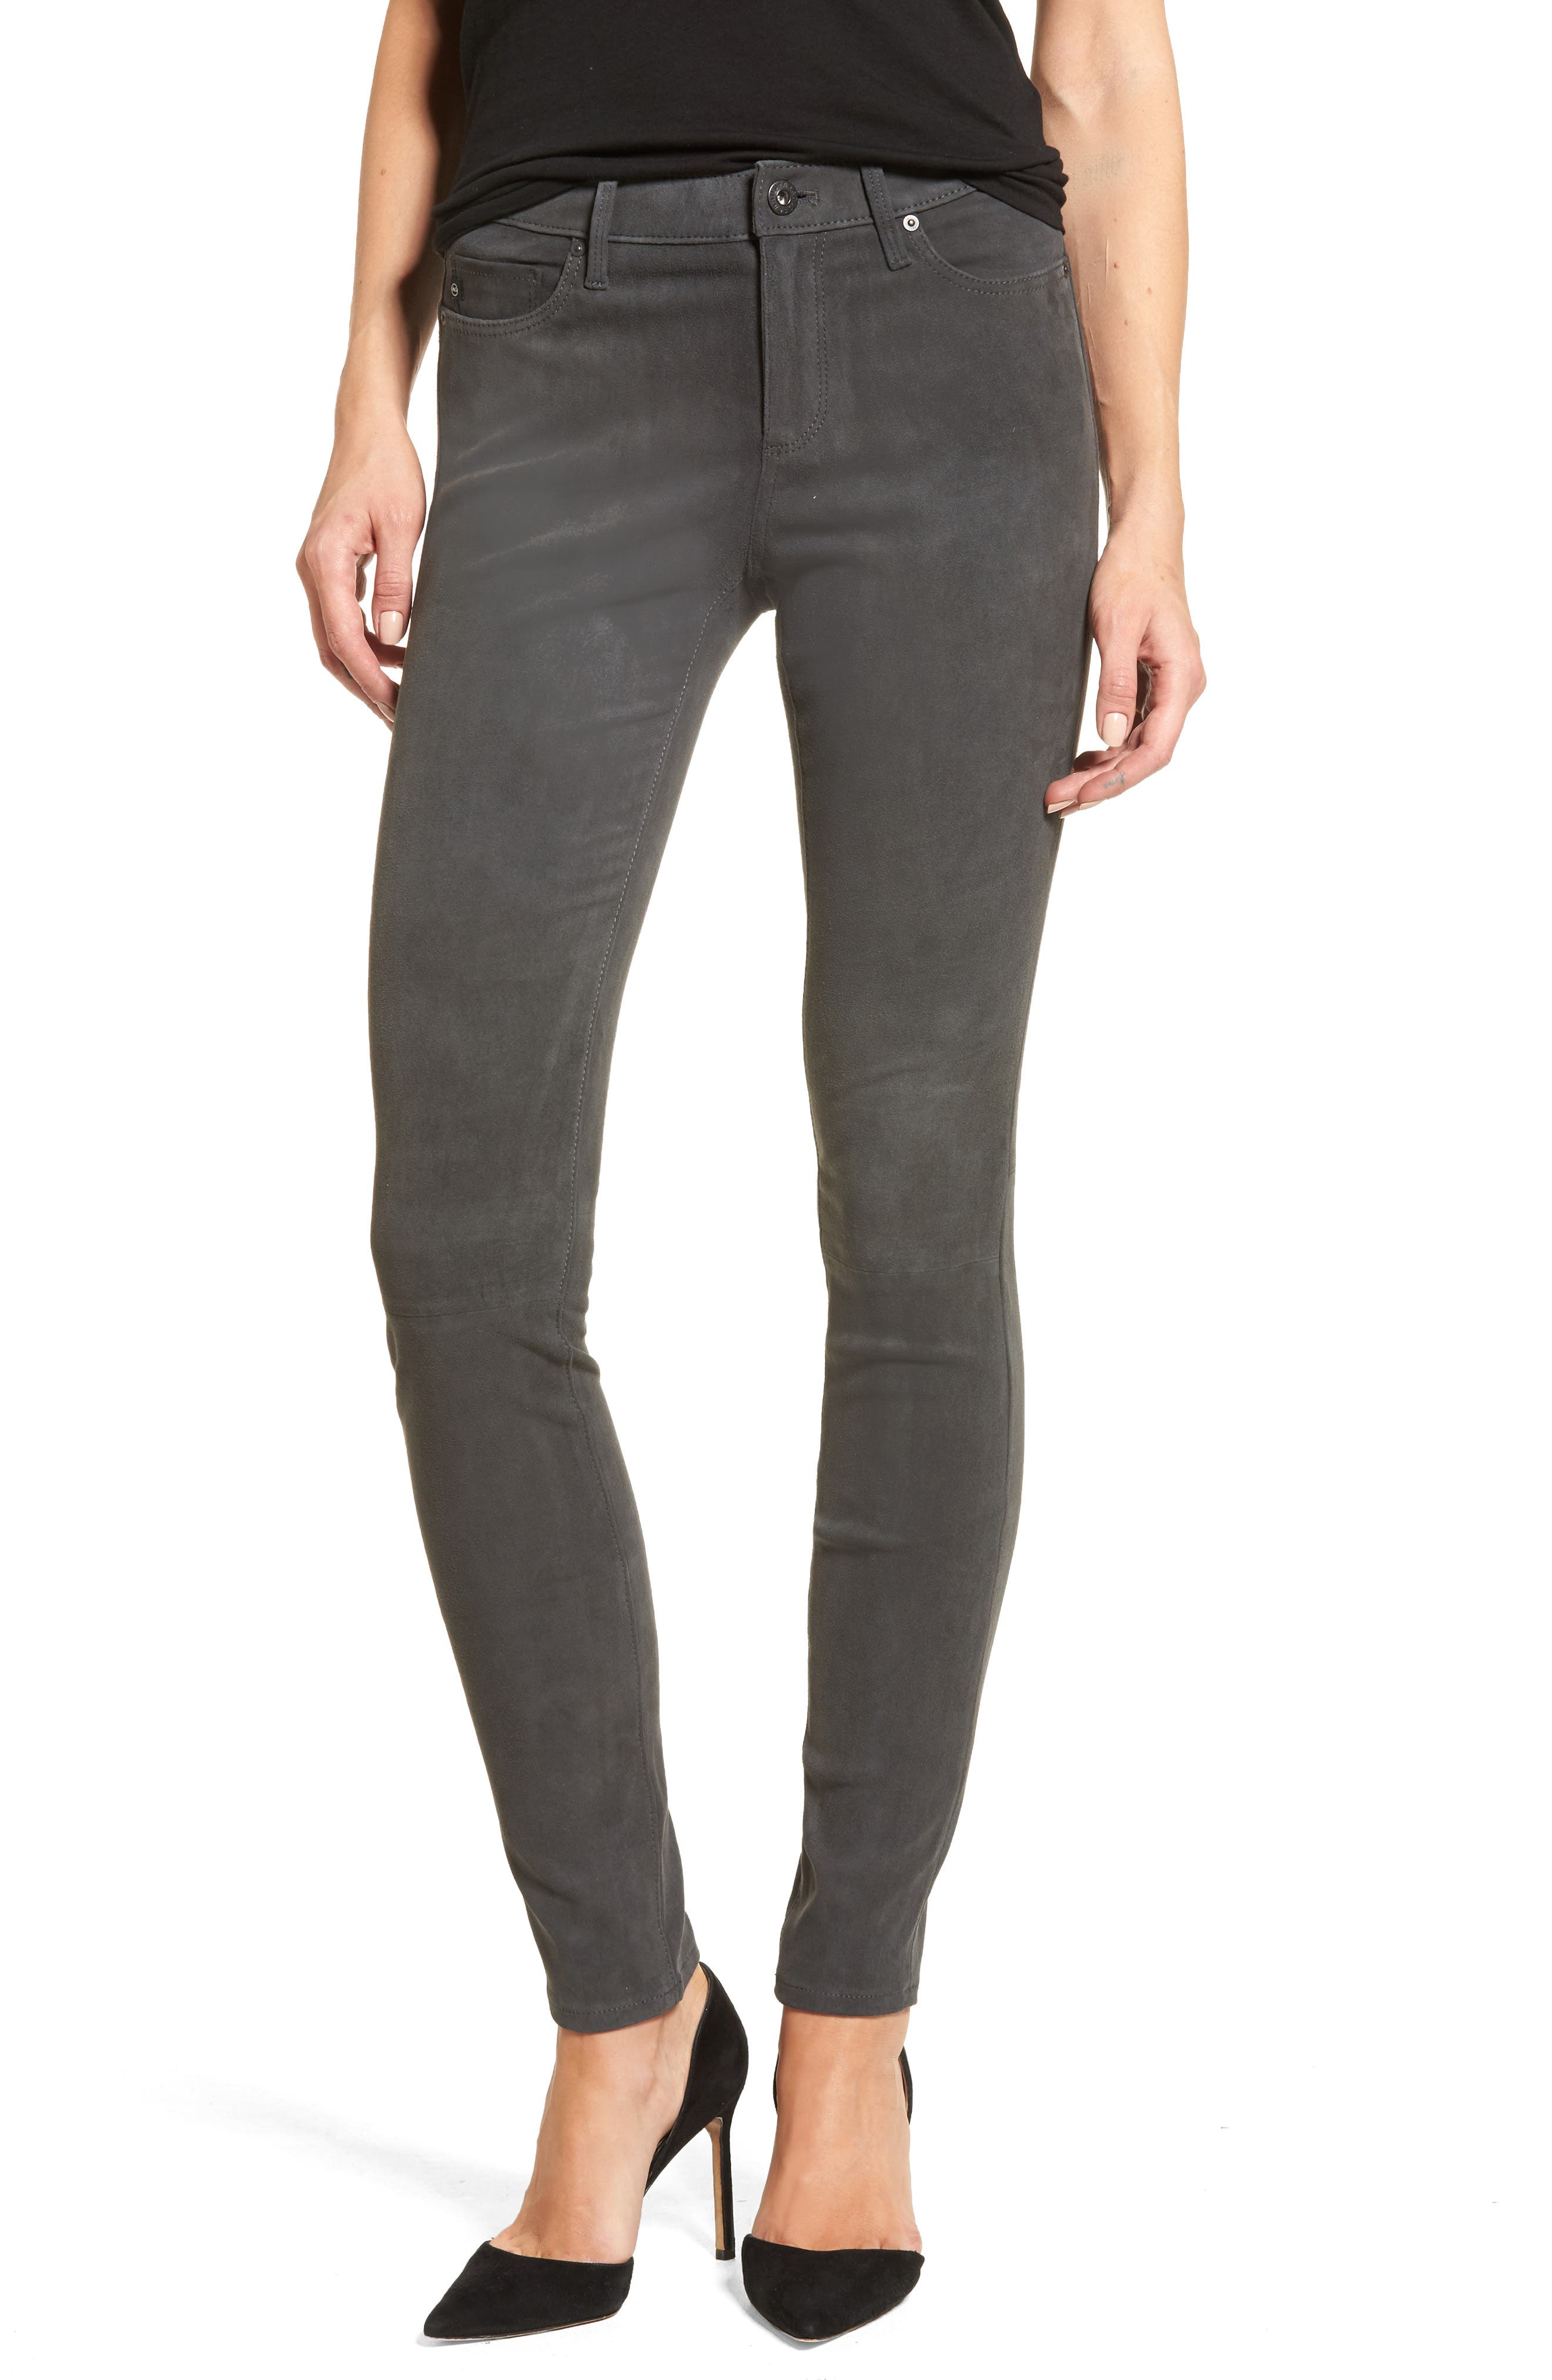 AG The Legging Super Skinny Suede Pants